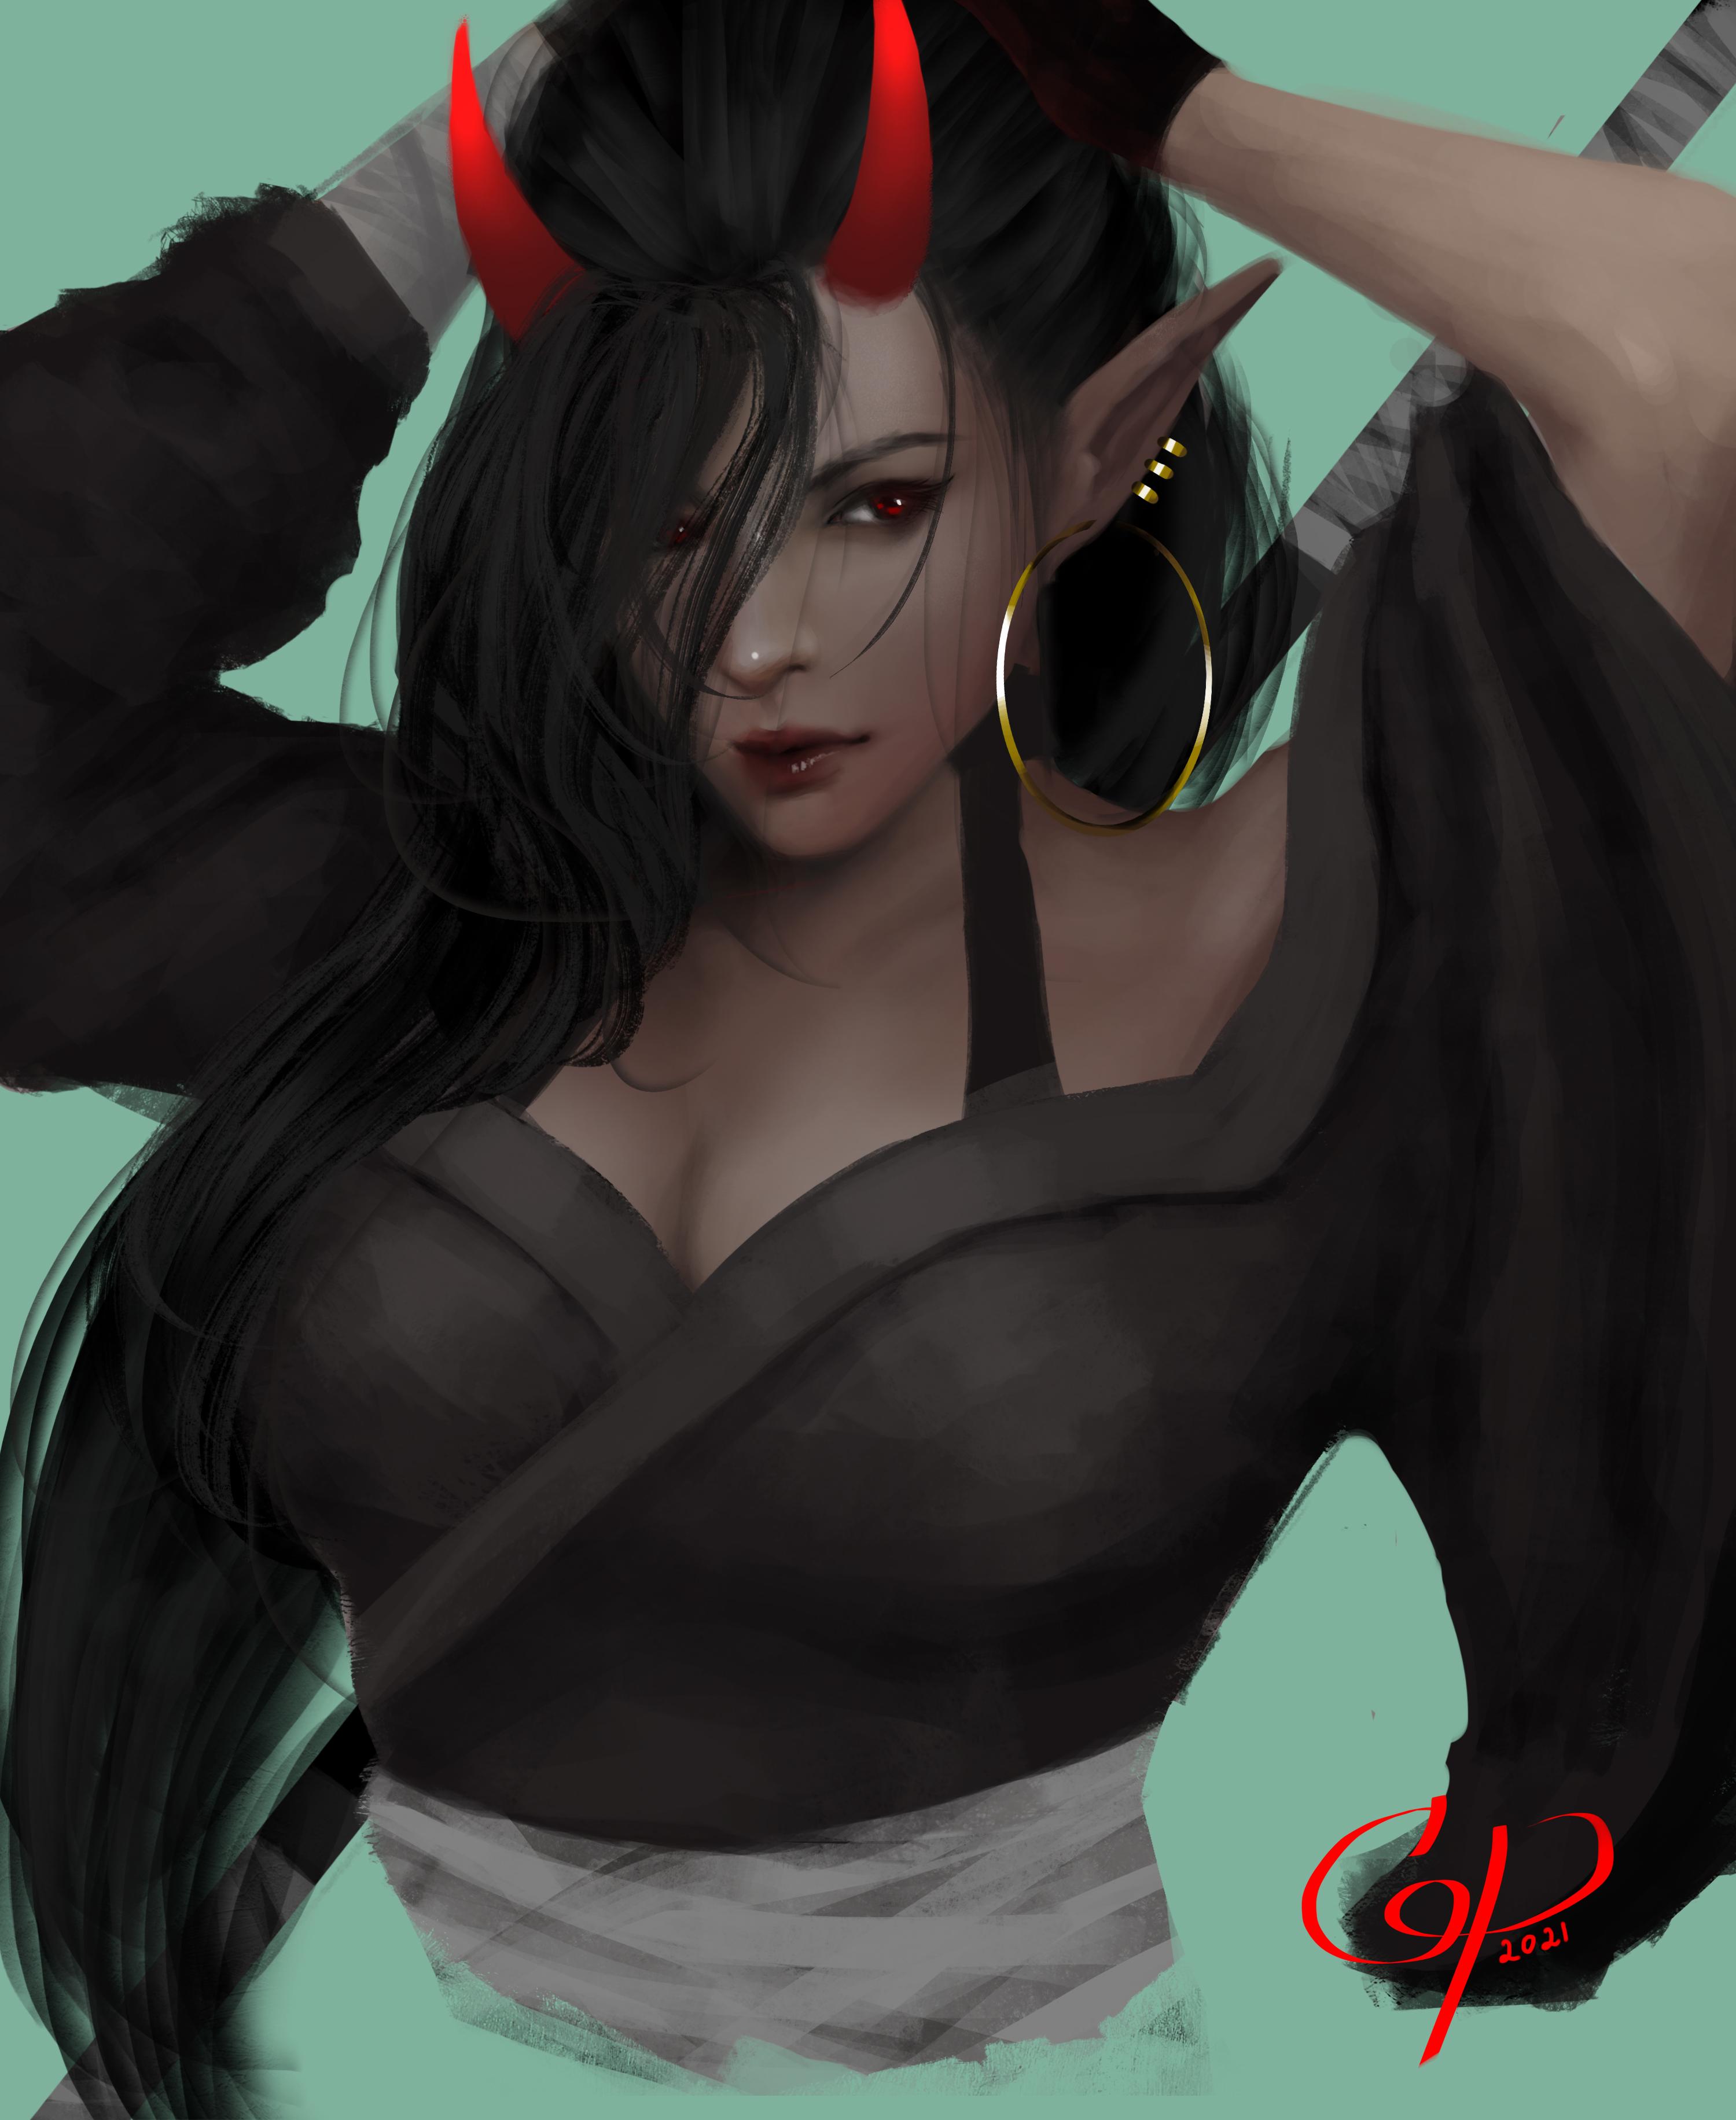 Original Characters Fan Art Character Design Portrait Illustration Horns Red Eyes Gus Piglet 3000x3664